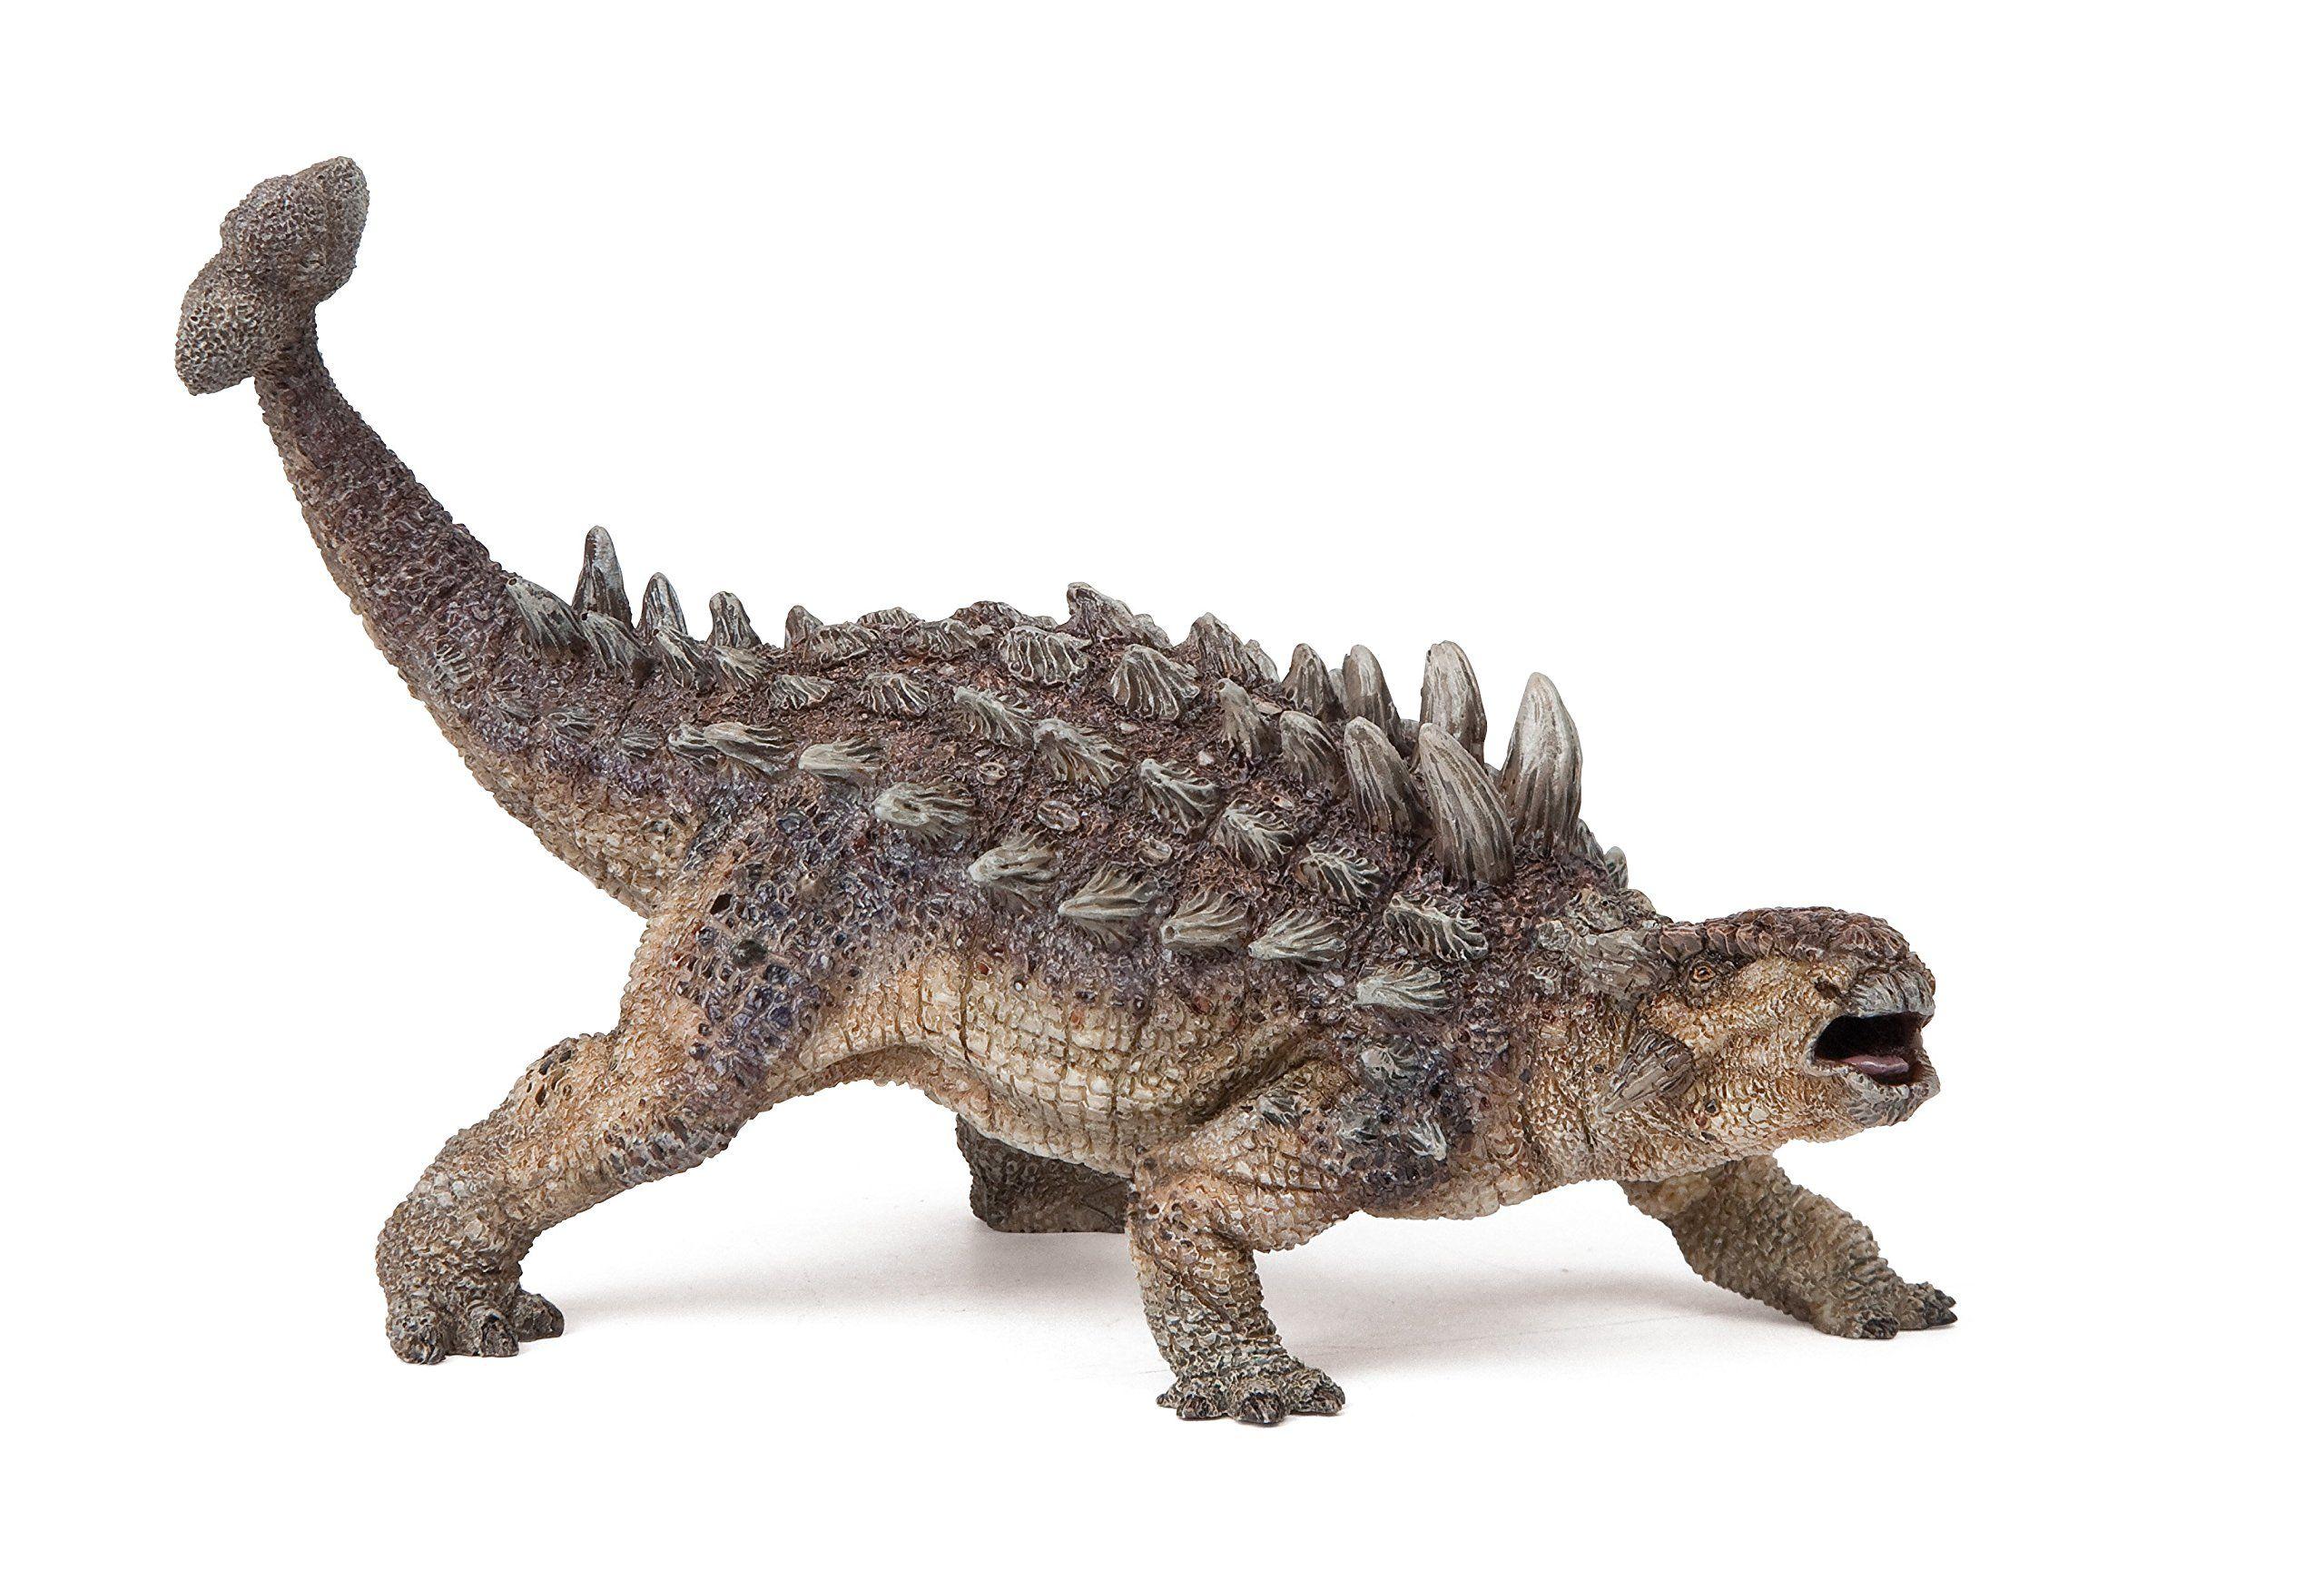 Dinosaurus dating